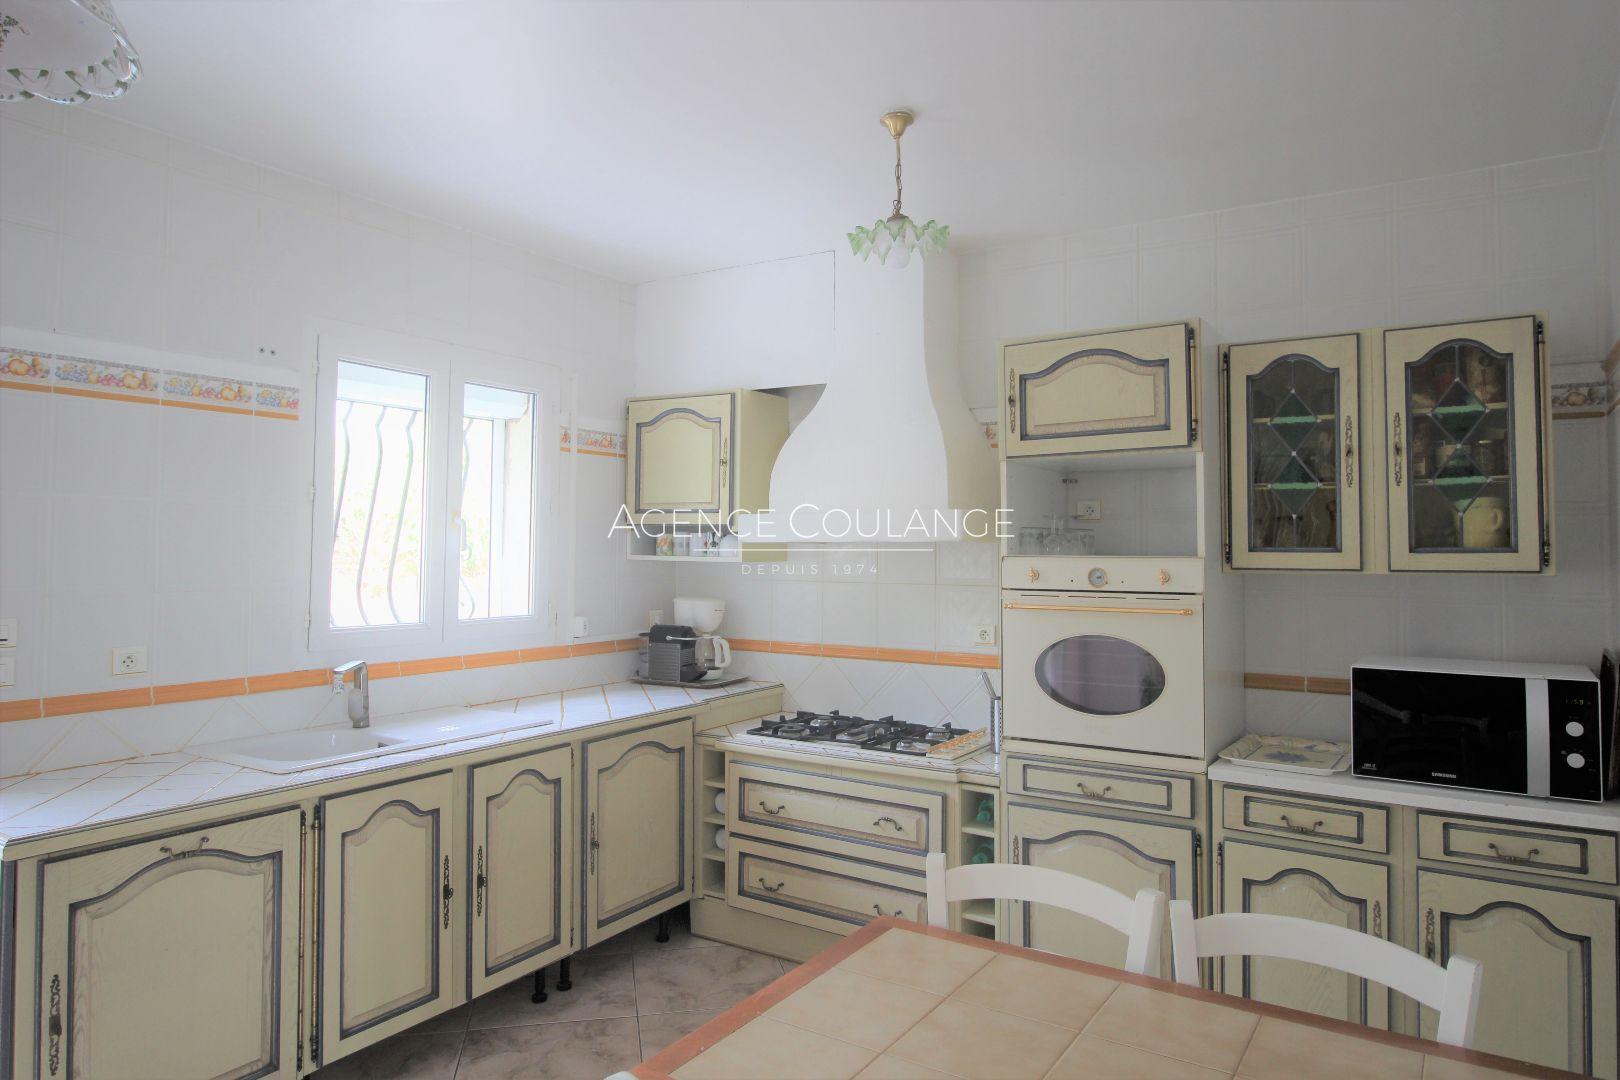 Vente maison villa saint cyr sur mer 83270 550 000 for Garage citroen saint cyr sur mer